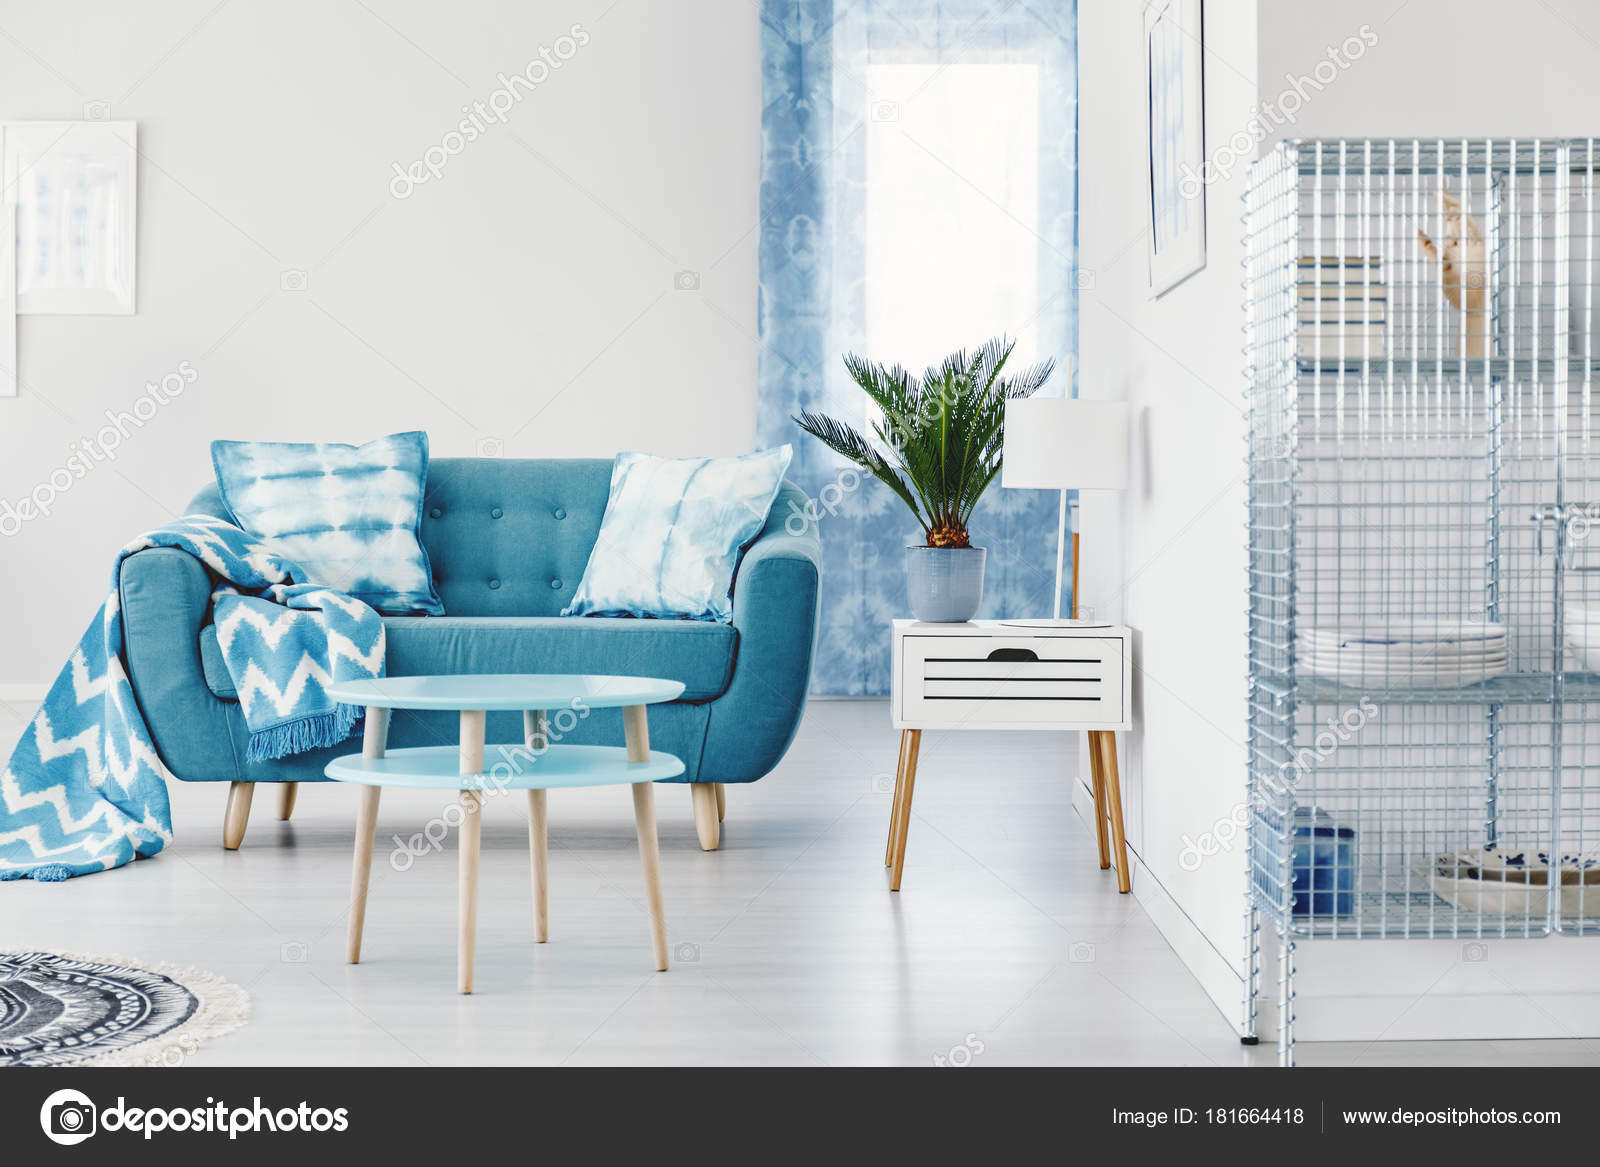 Türkis Wohnung Innenarchitektur — Stockfoto © photographee.eu #181664418